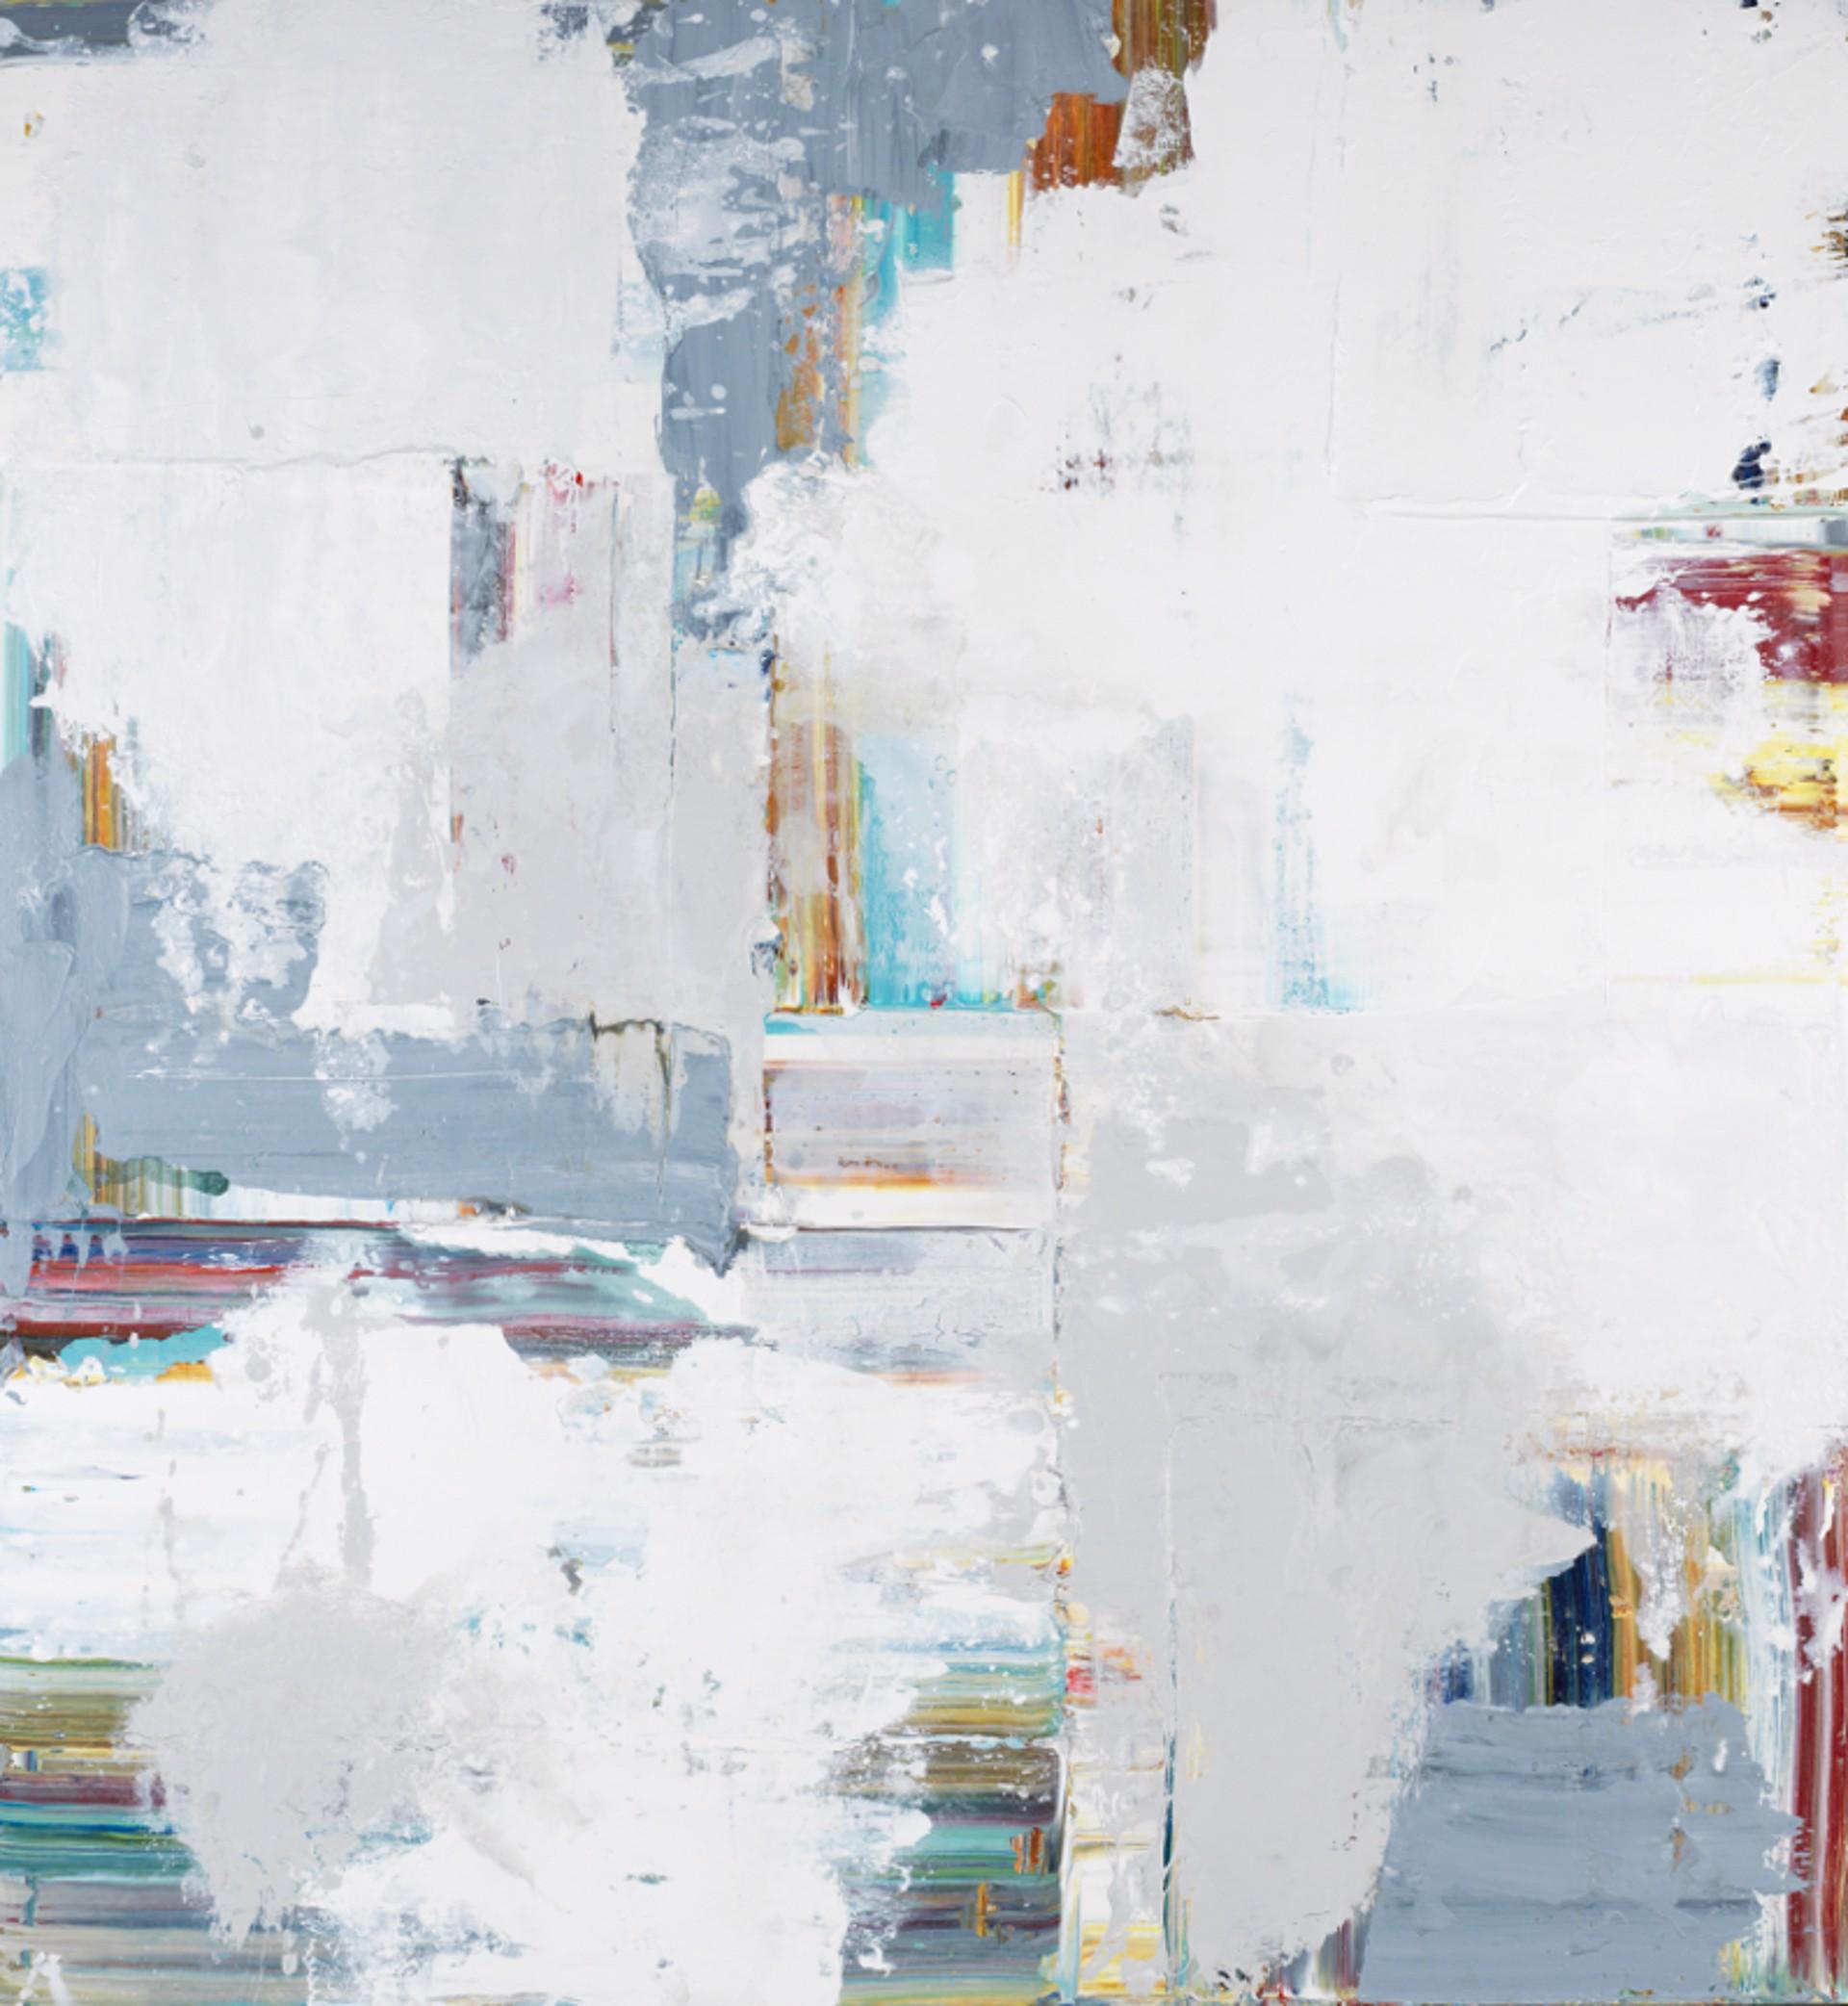 Astratto #93 by John Schuyler